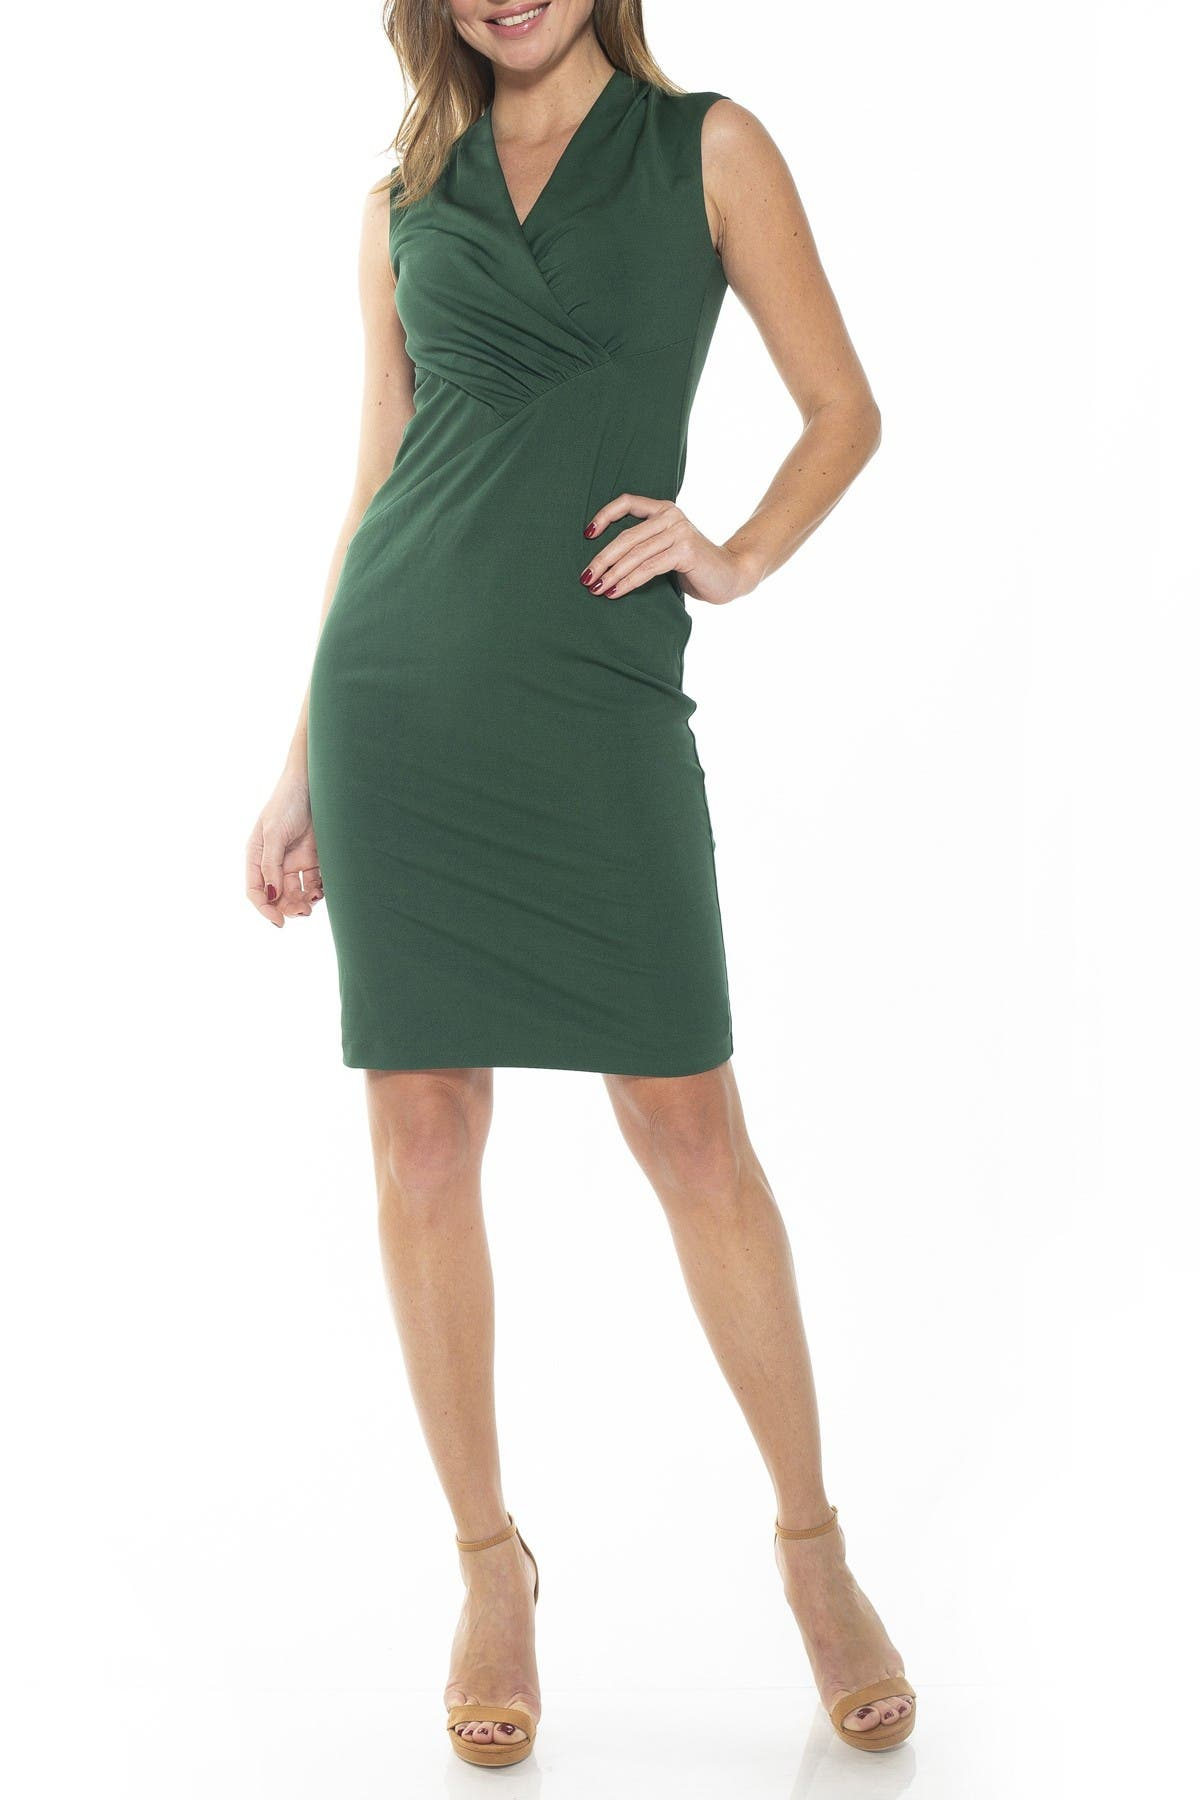 Image of Alexia Admor Cora Ruched Asymmetrical Sheath Dress